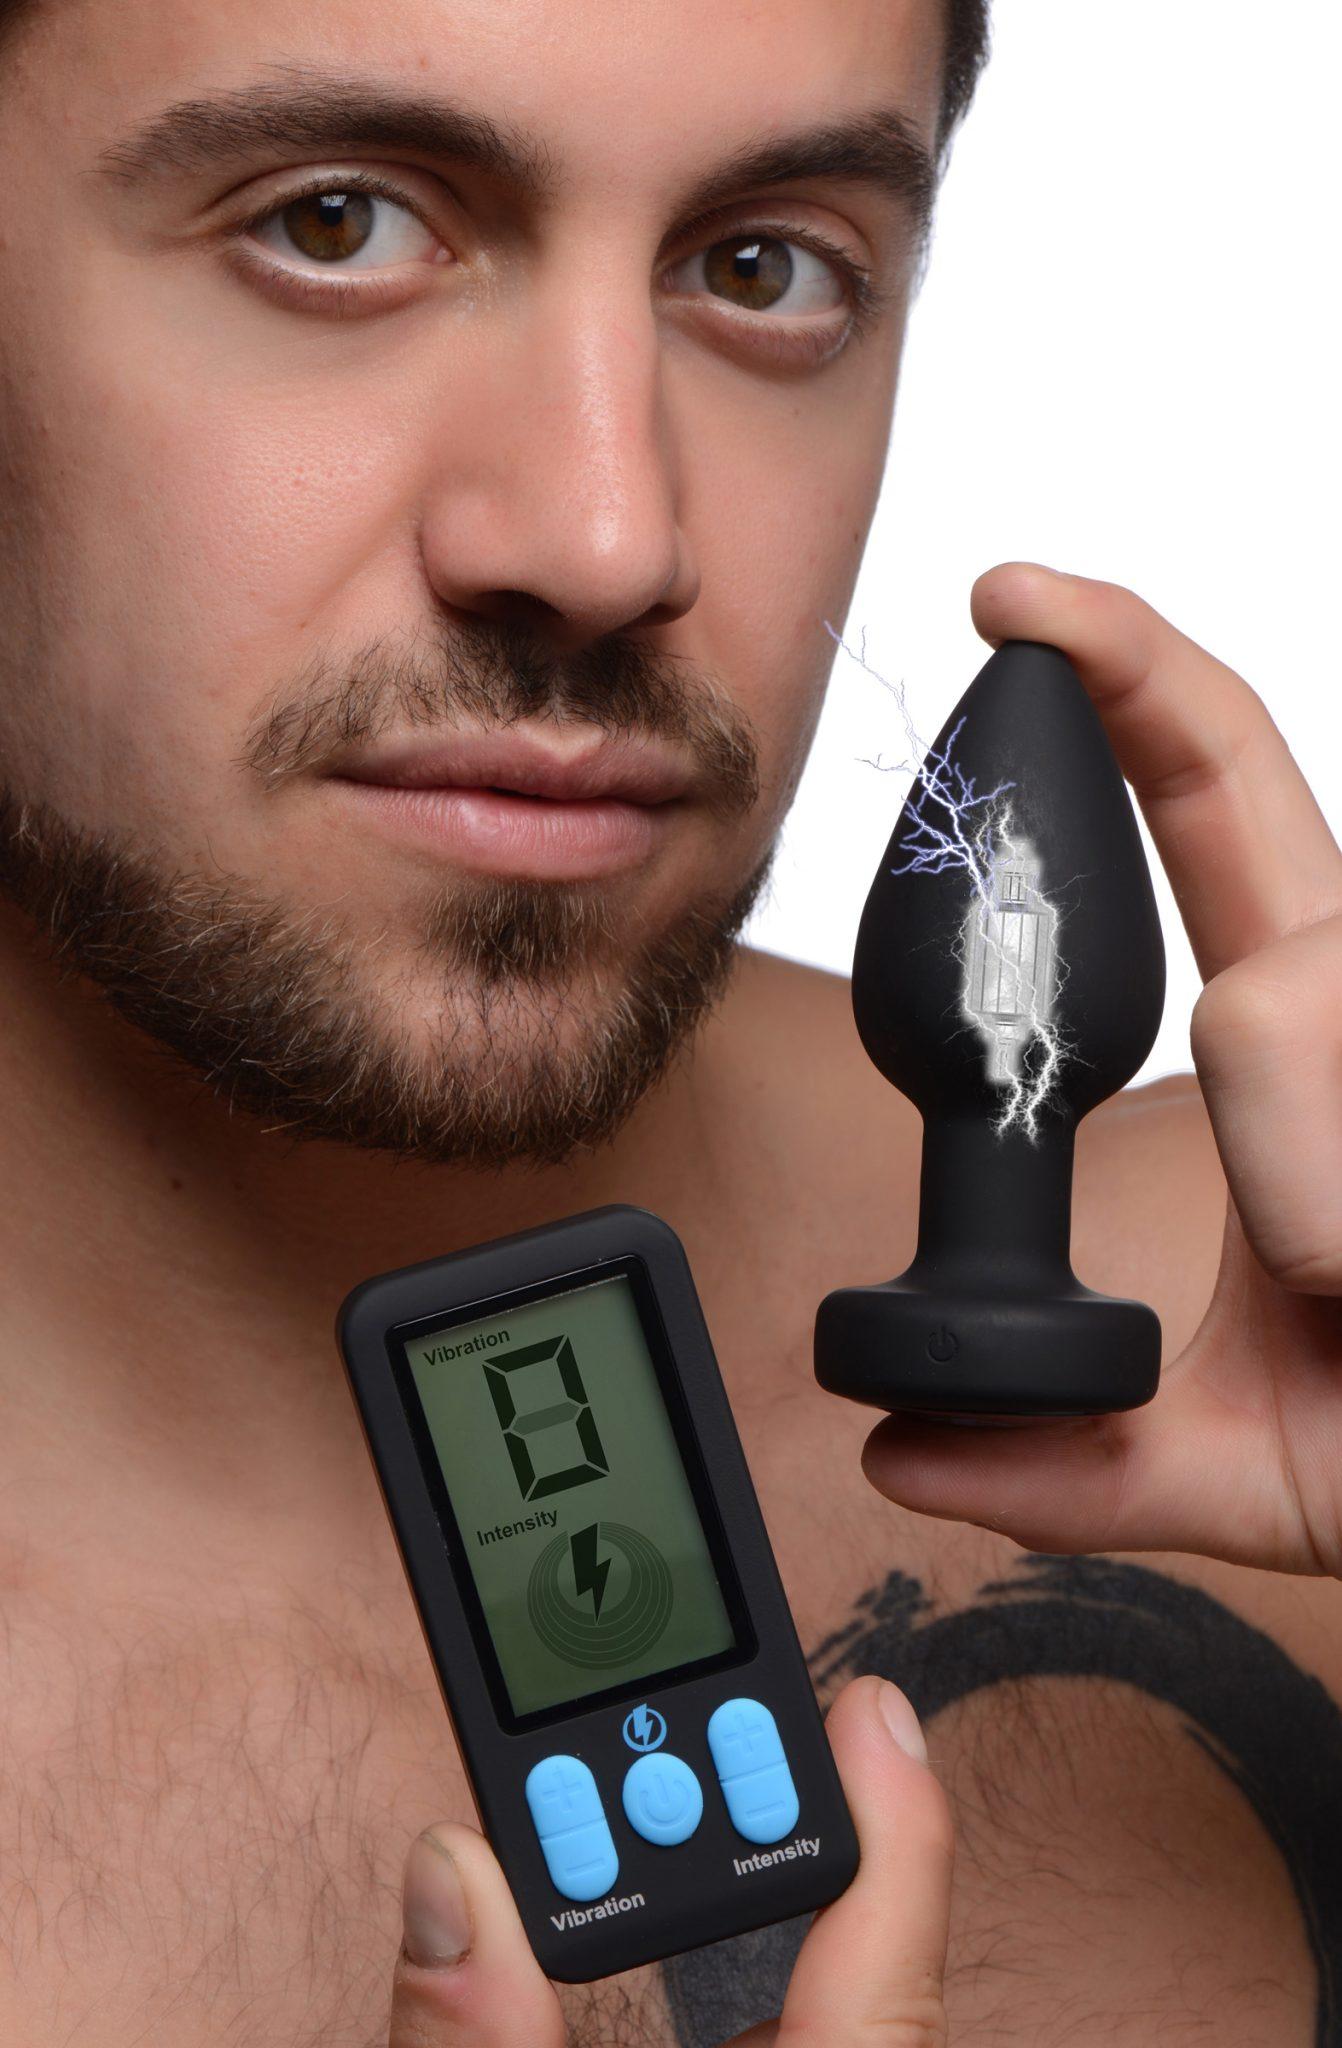 E-Stim Pro Silicone Vibrating Anal Plug with Remote Control